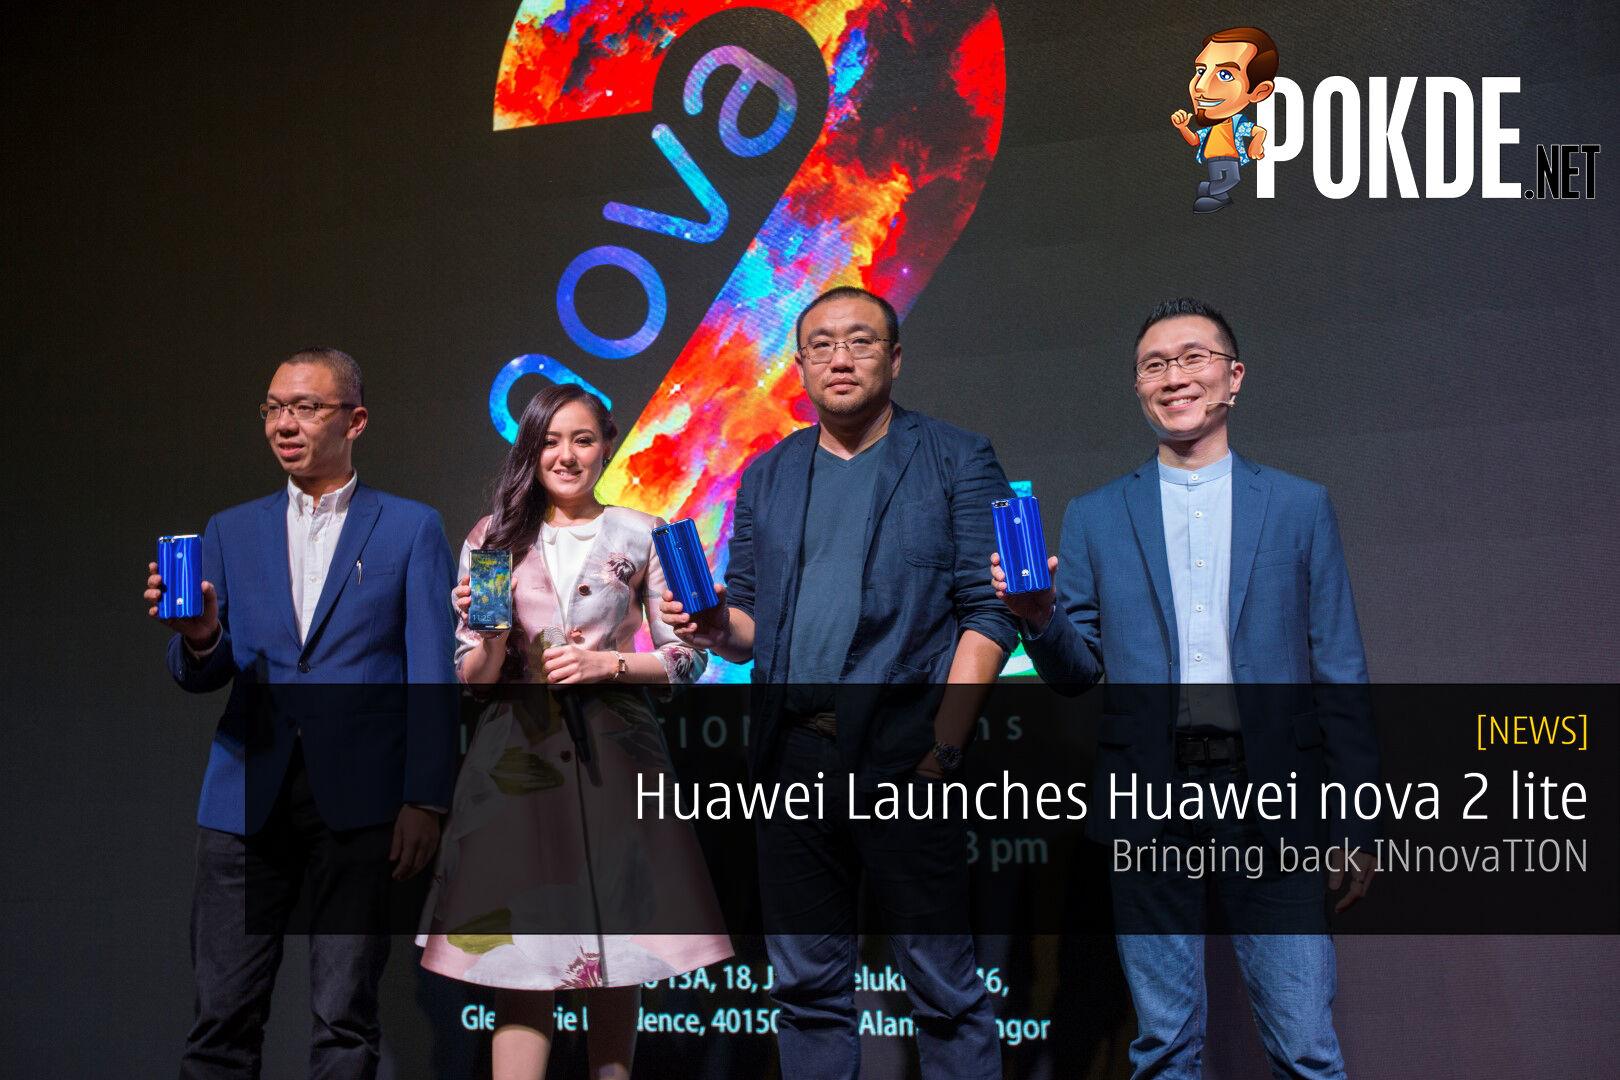 Huawei Launches Huawei nova 2 lite - Bringing back INnovaTION 42